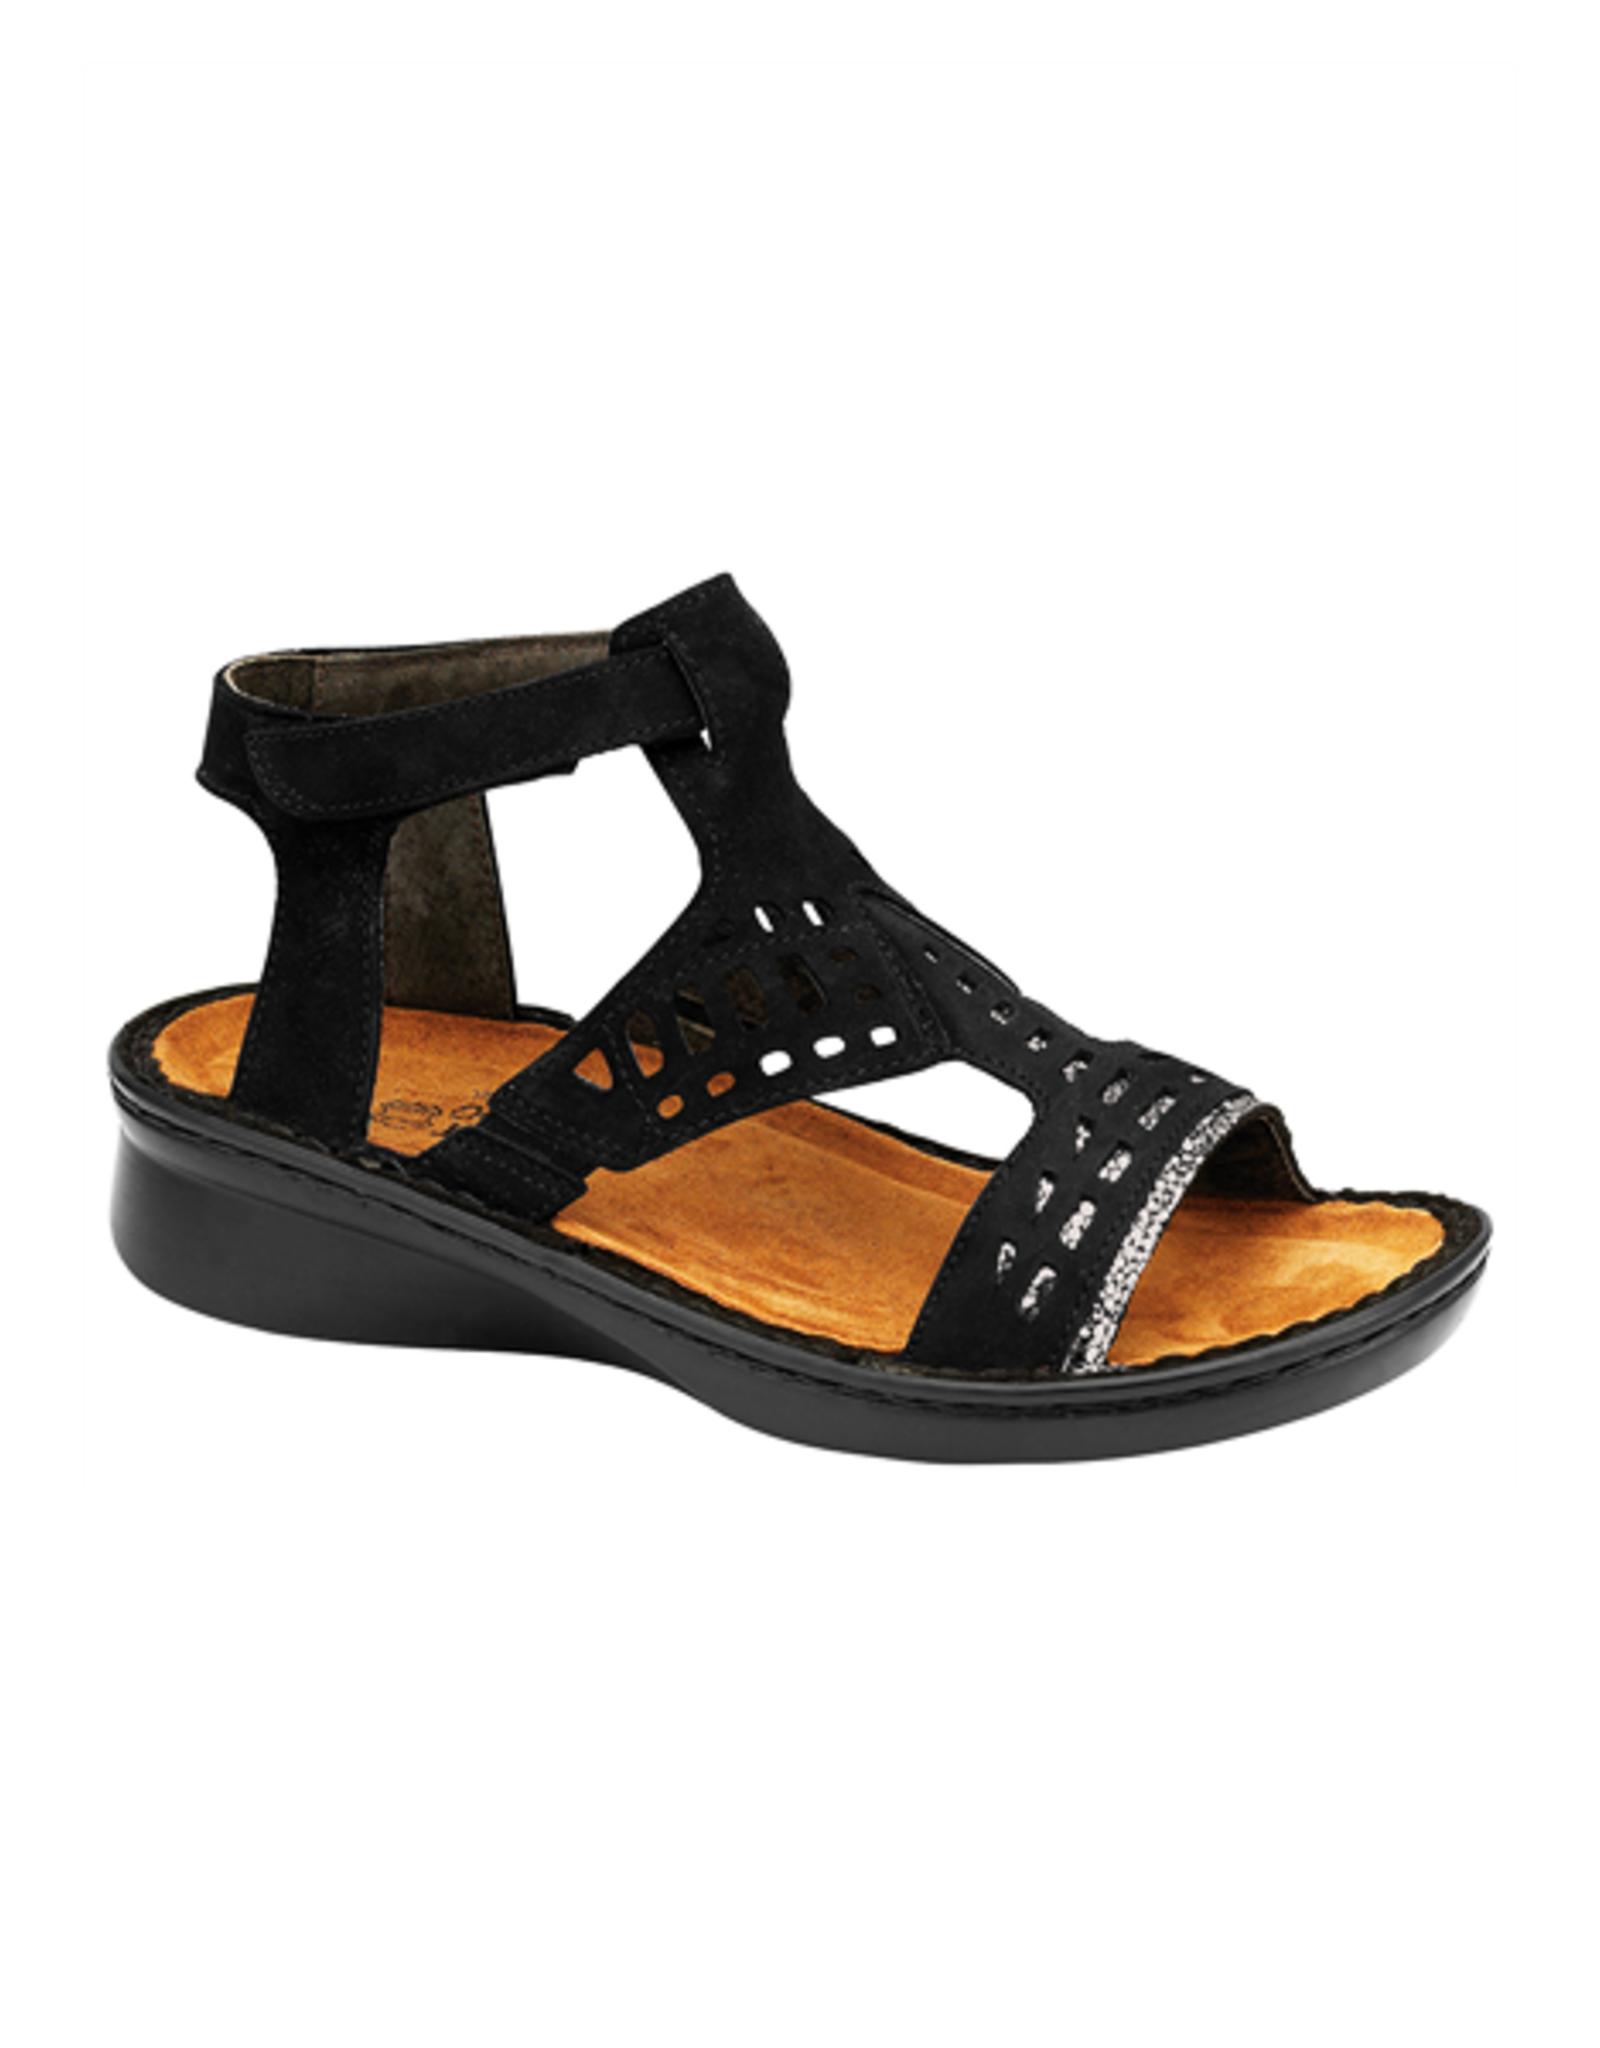 Naot Footwear String in Black Combo